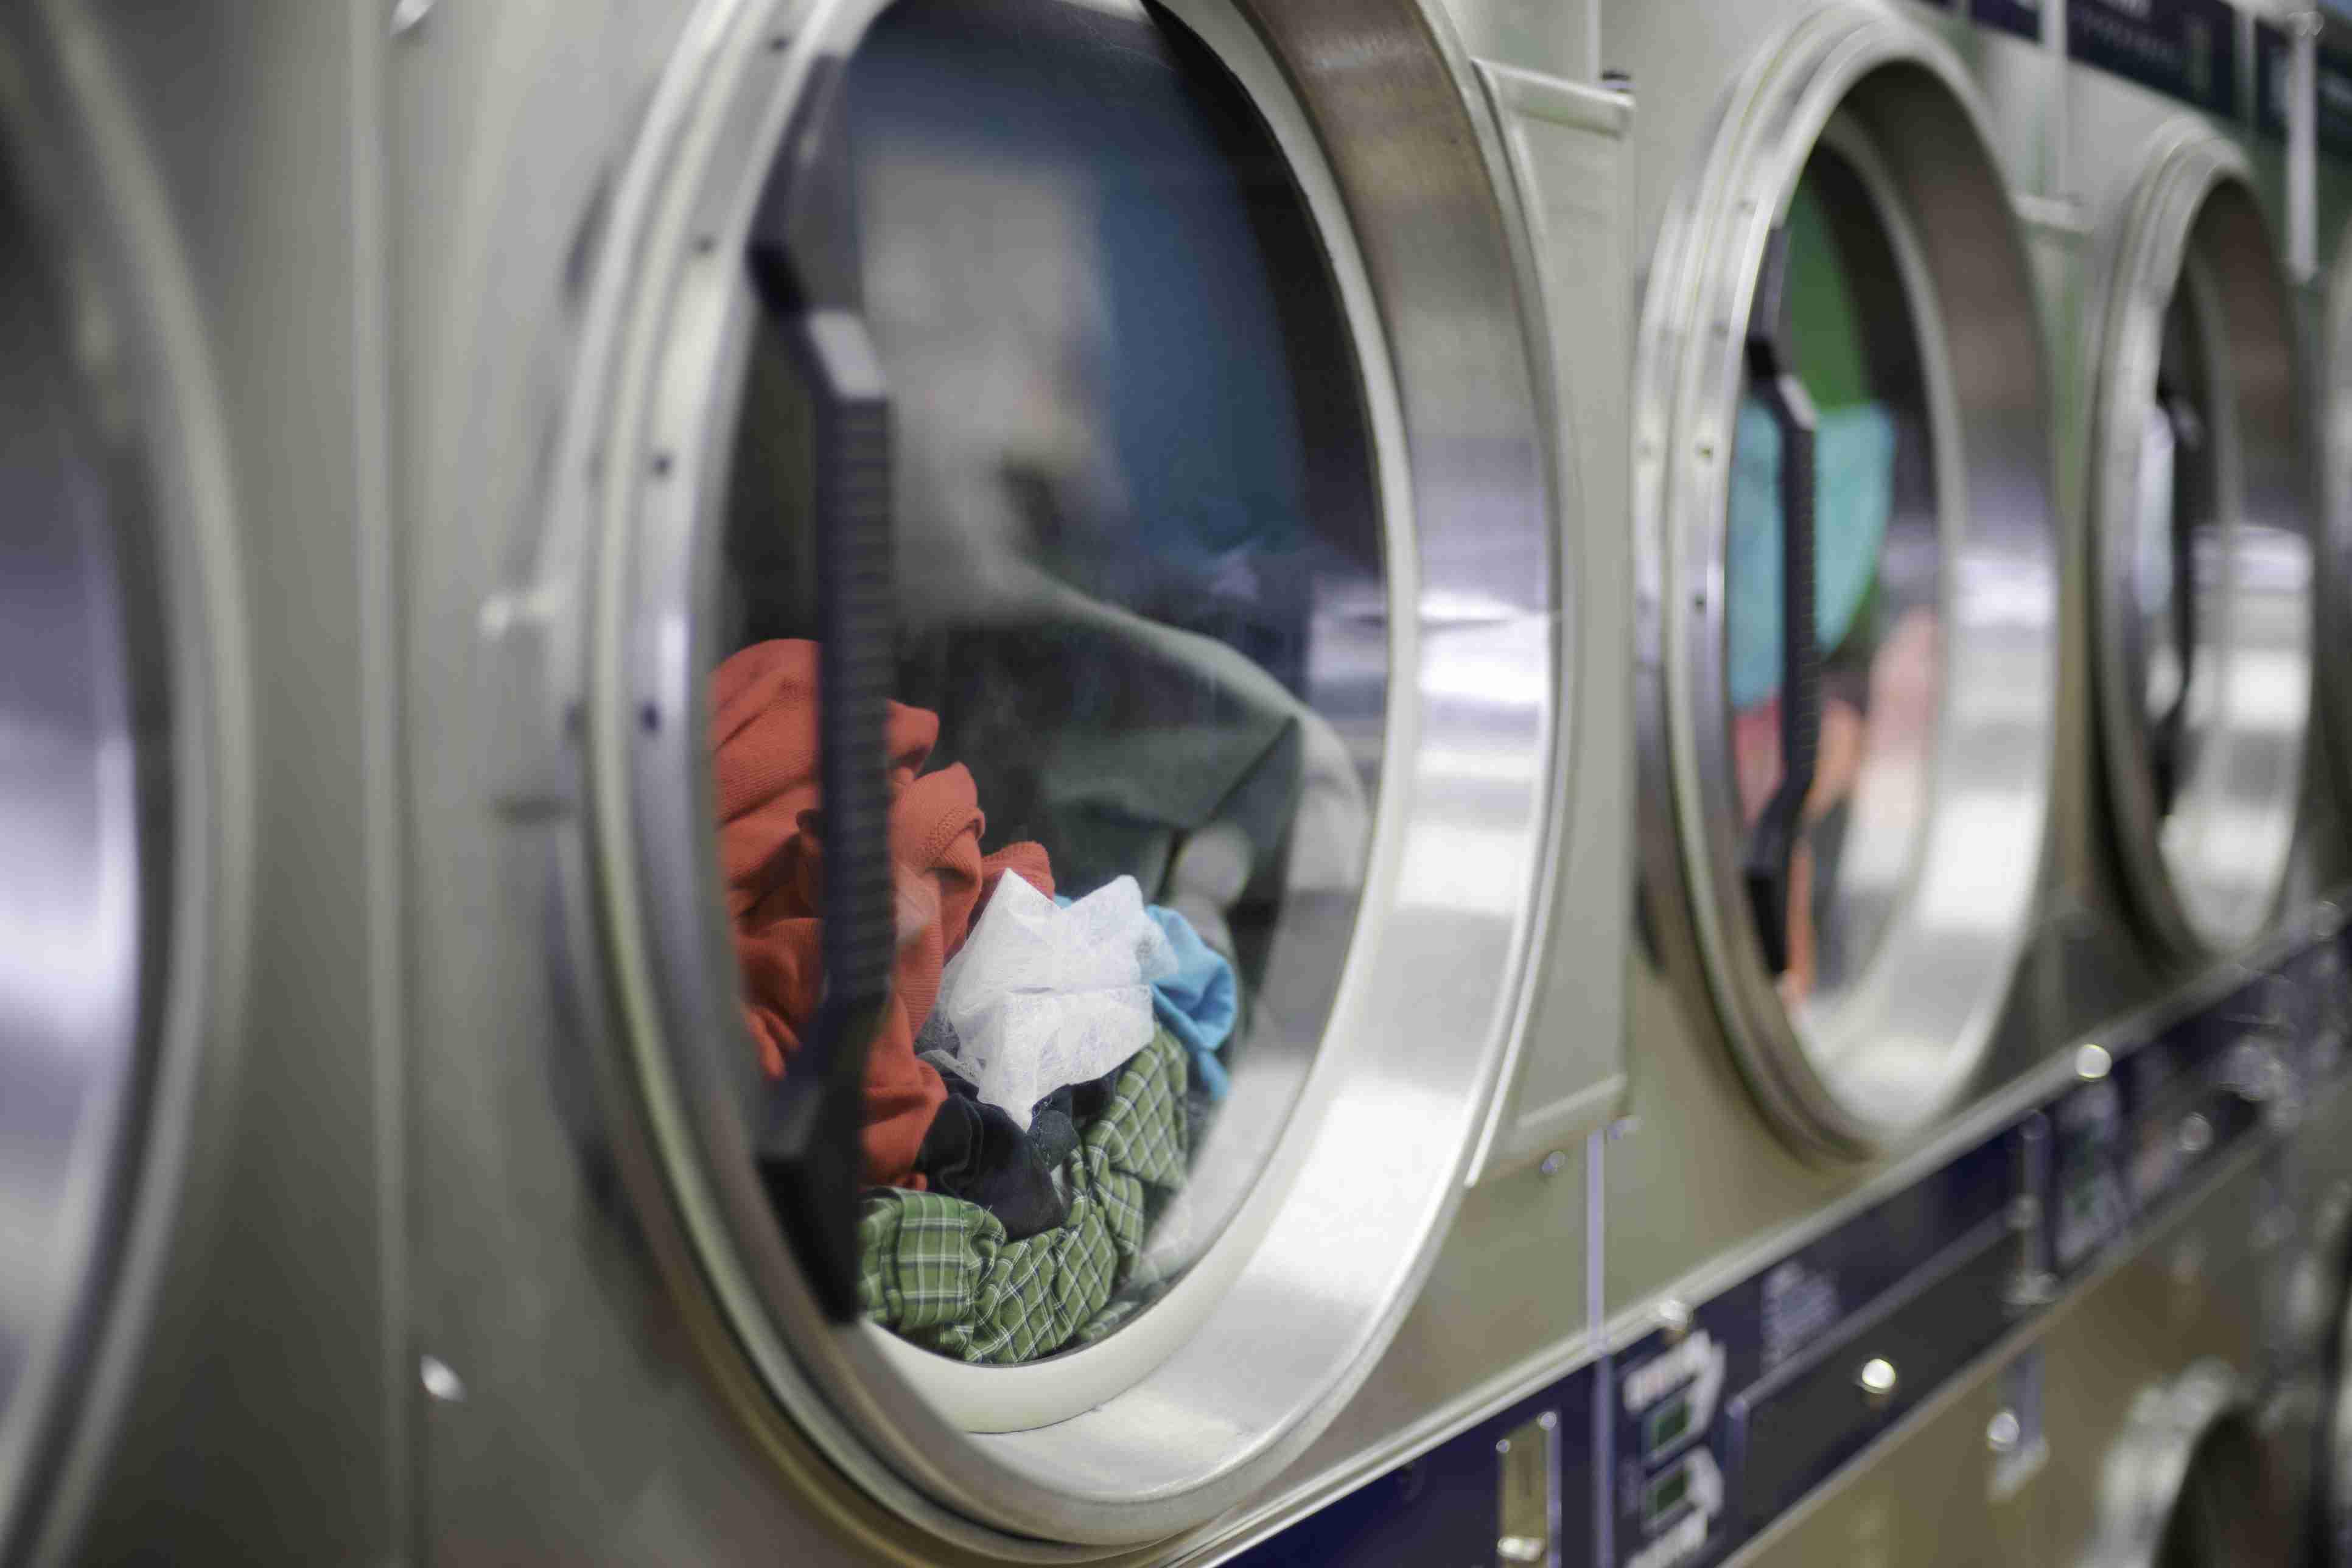 Laundromat machines